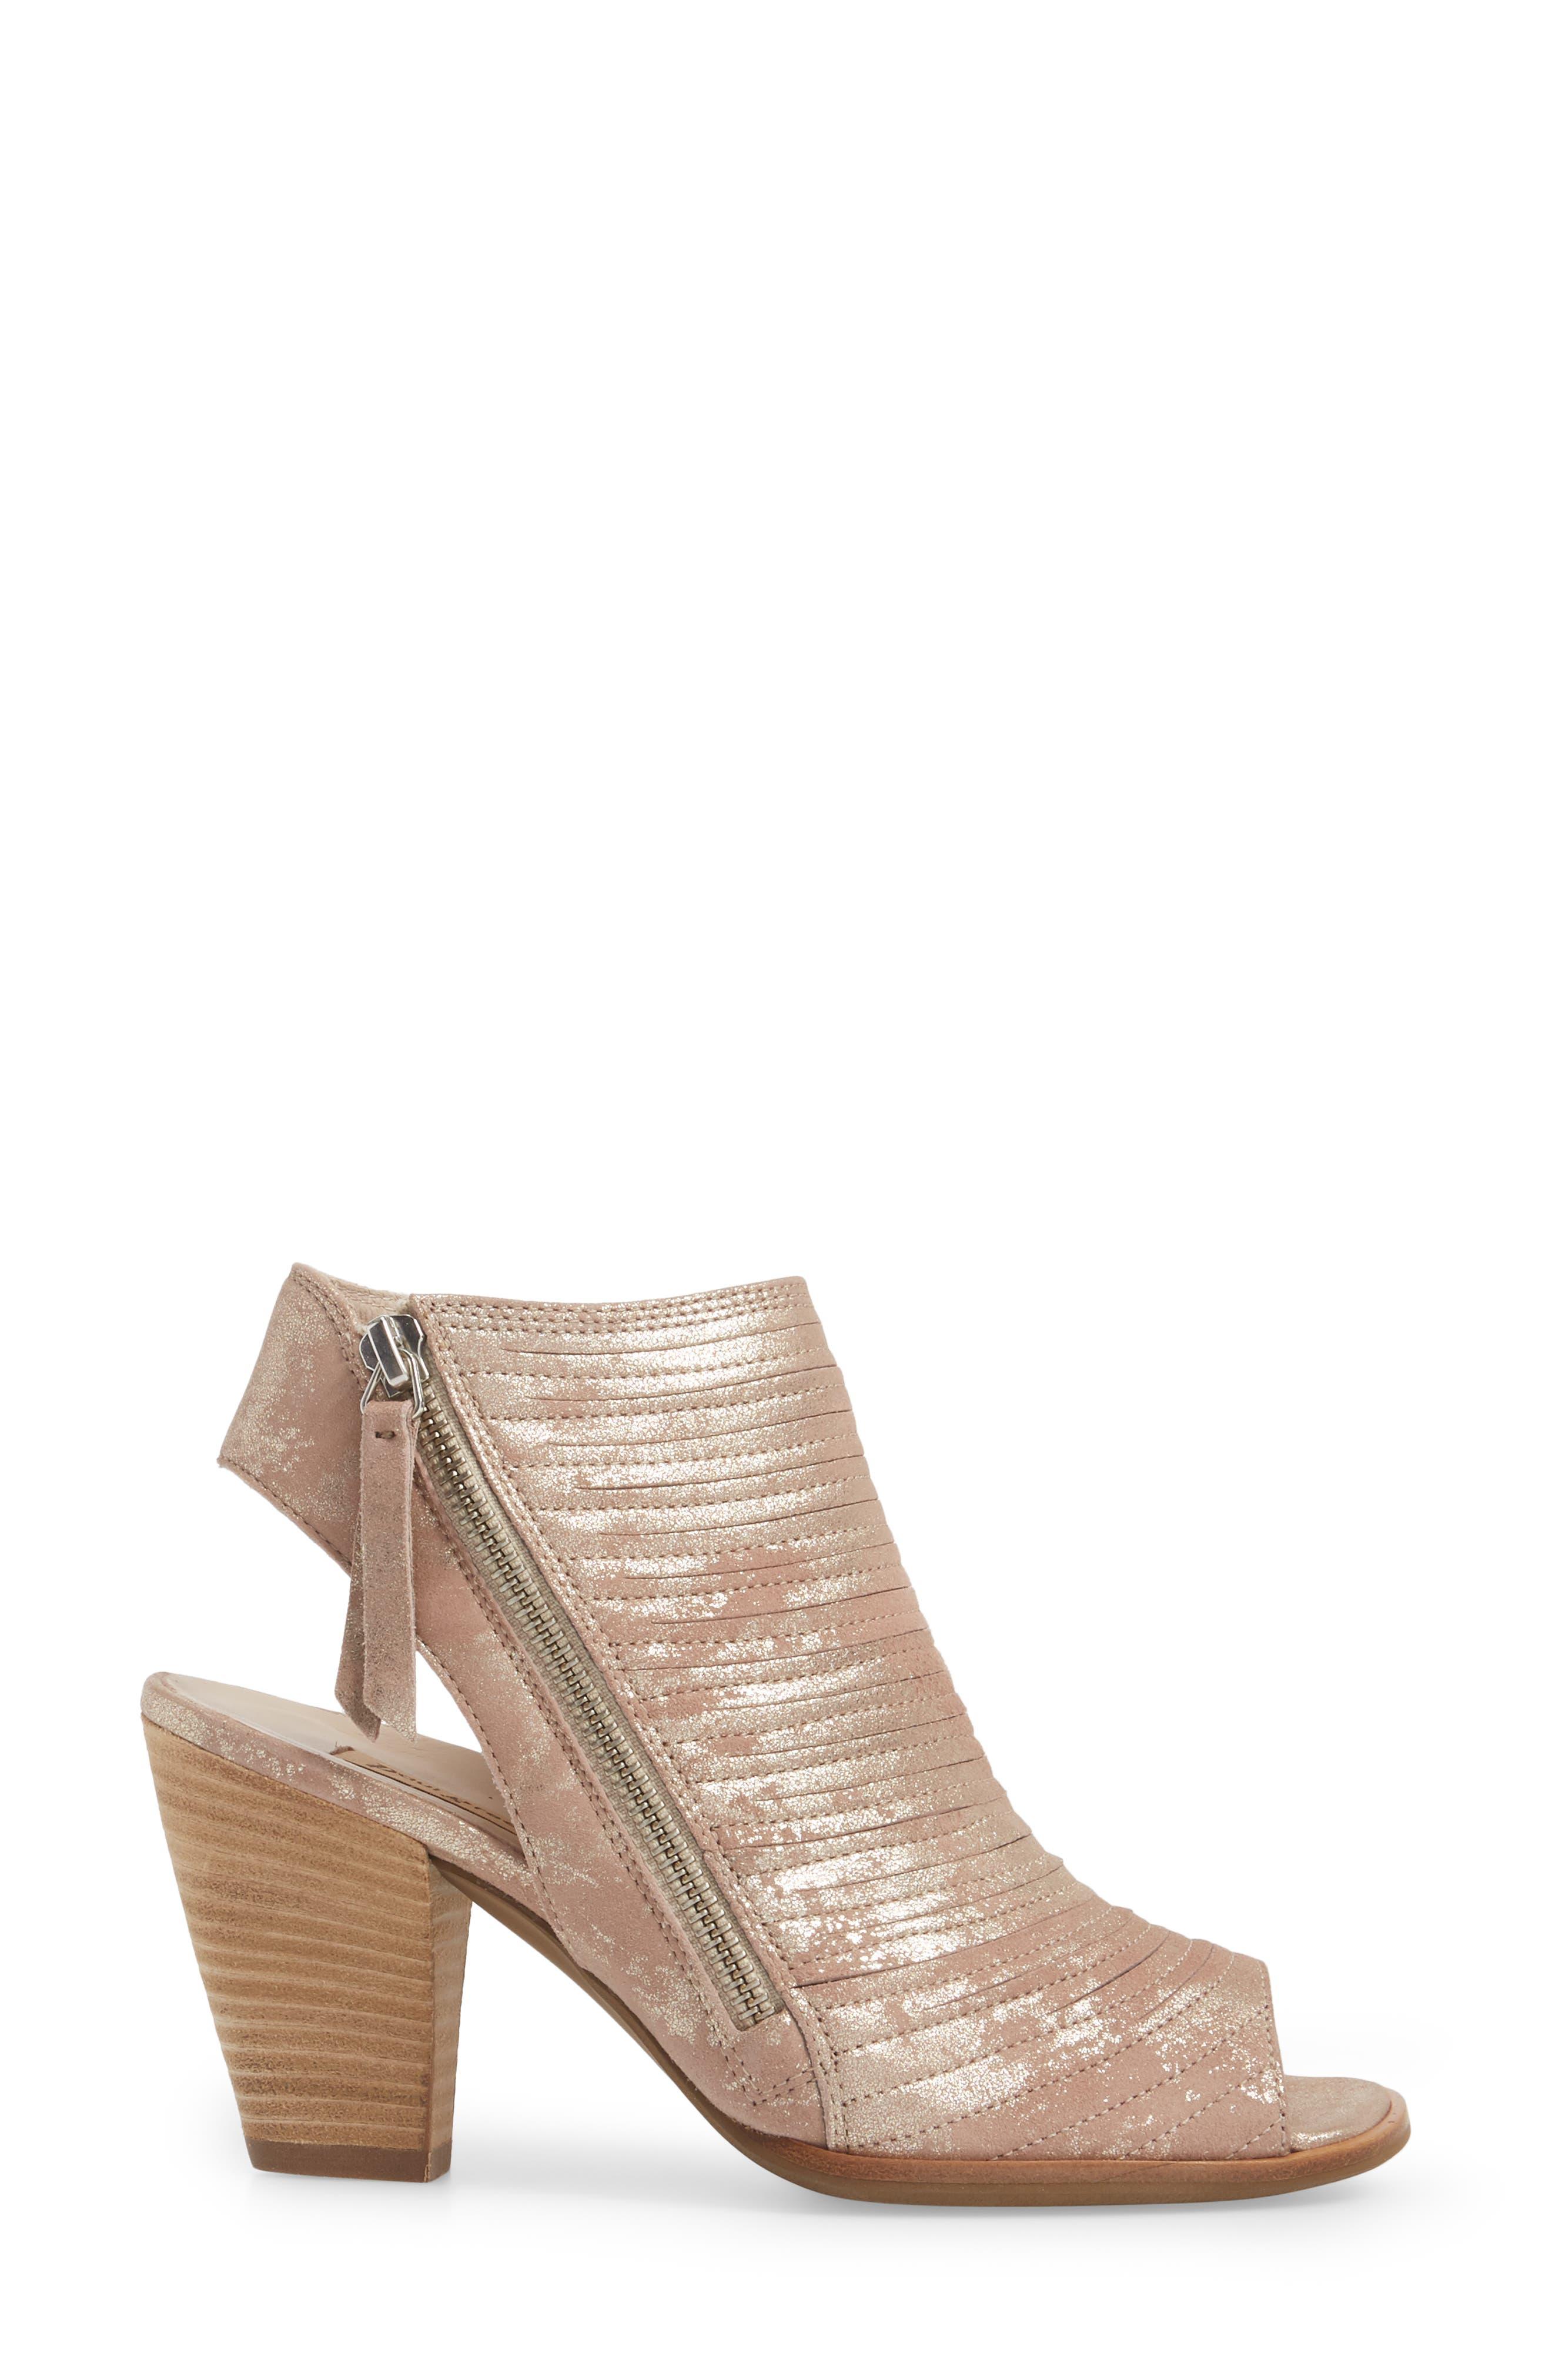 'Cayanne' Leather Peep Toe Sandal,                             Alternate thumbnail 21, color,